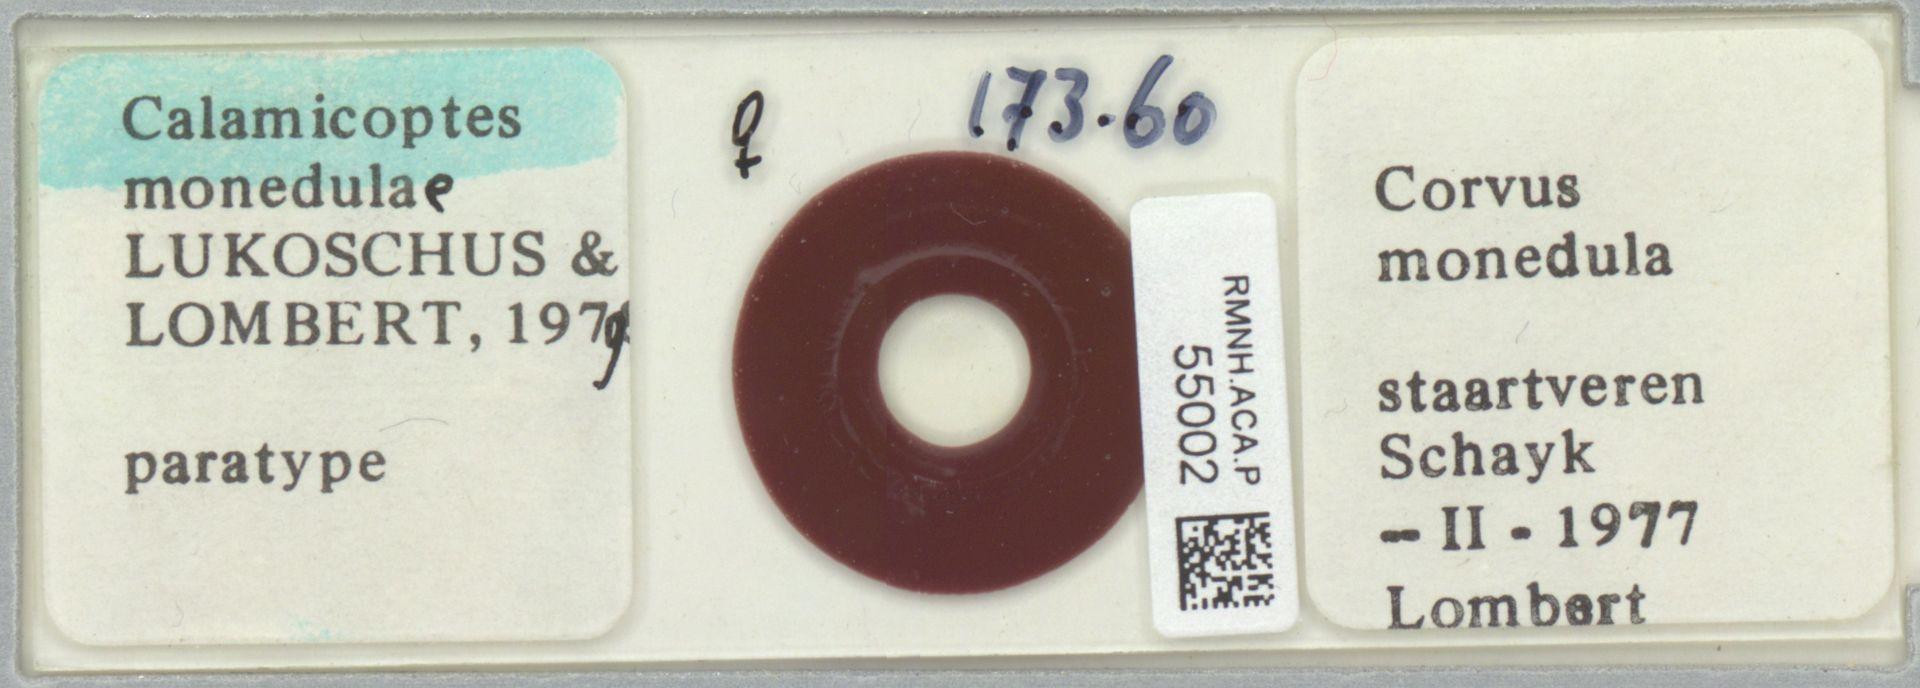 RMNH.ACA.P.55002 | Calamicoptes monedulae Lukoschus & Lombert, 1979